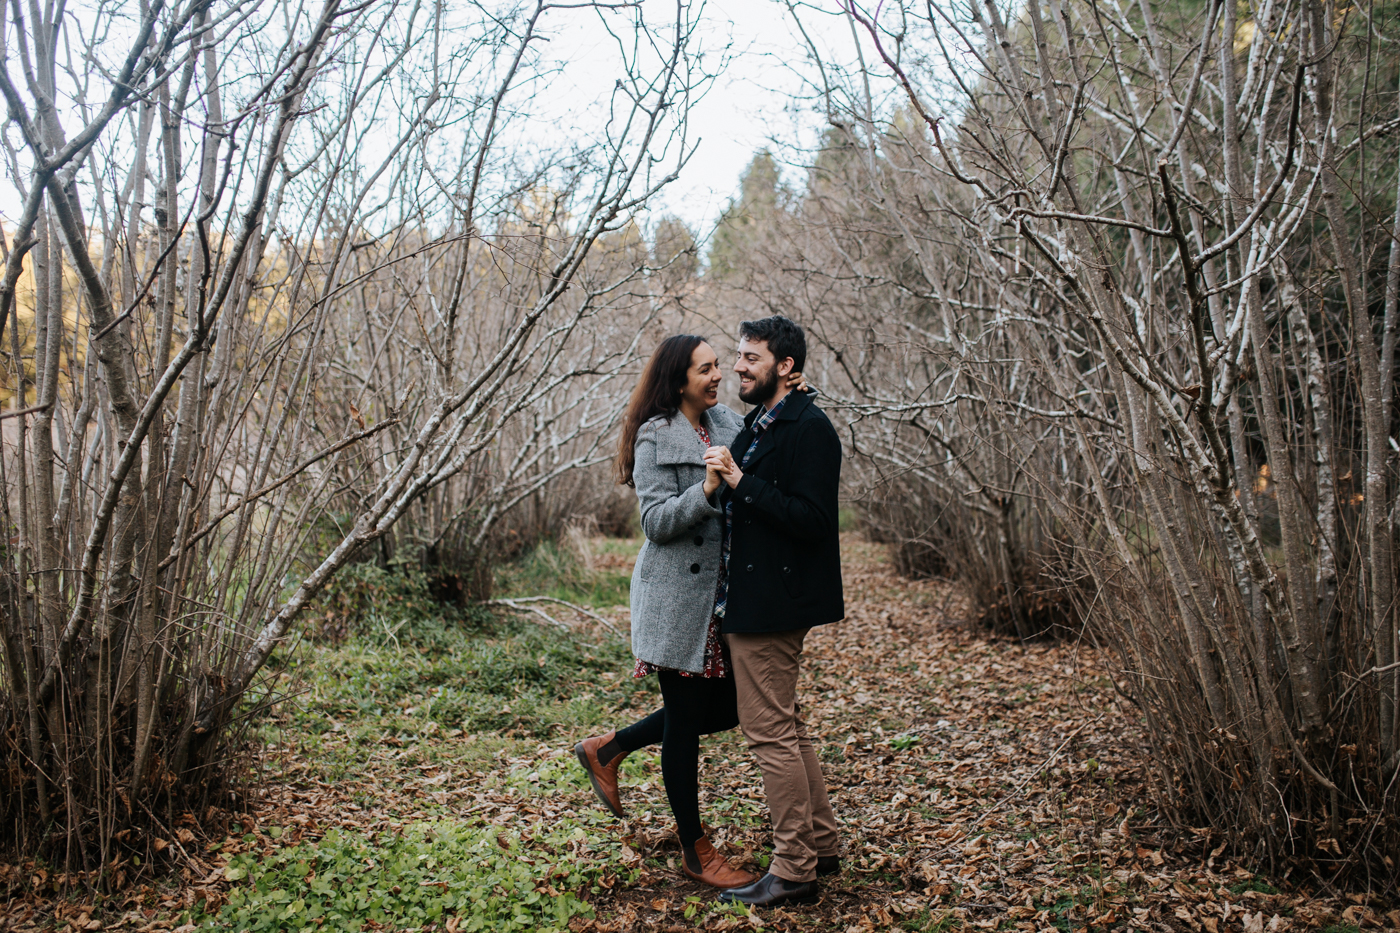 Kate & Kieran - Southern Highlands Engagement - Samantha Heather Photography-35.jpg